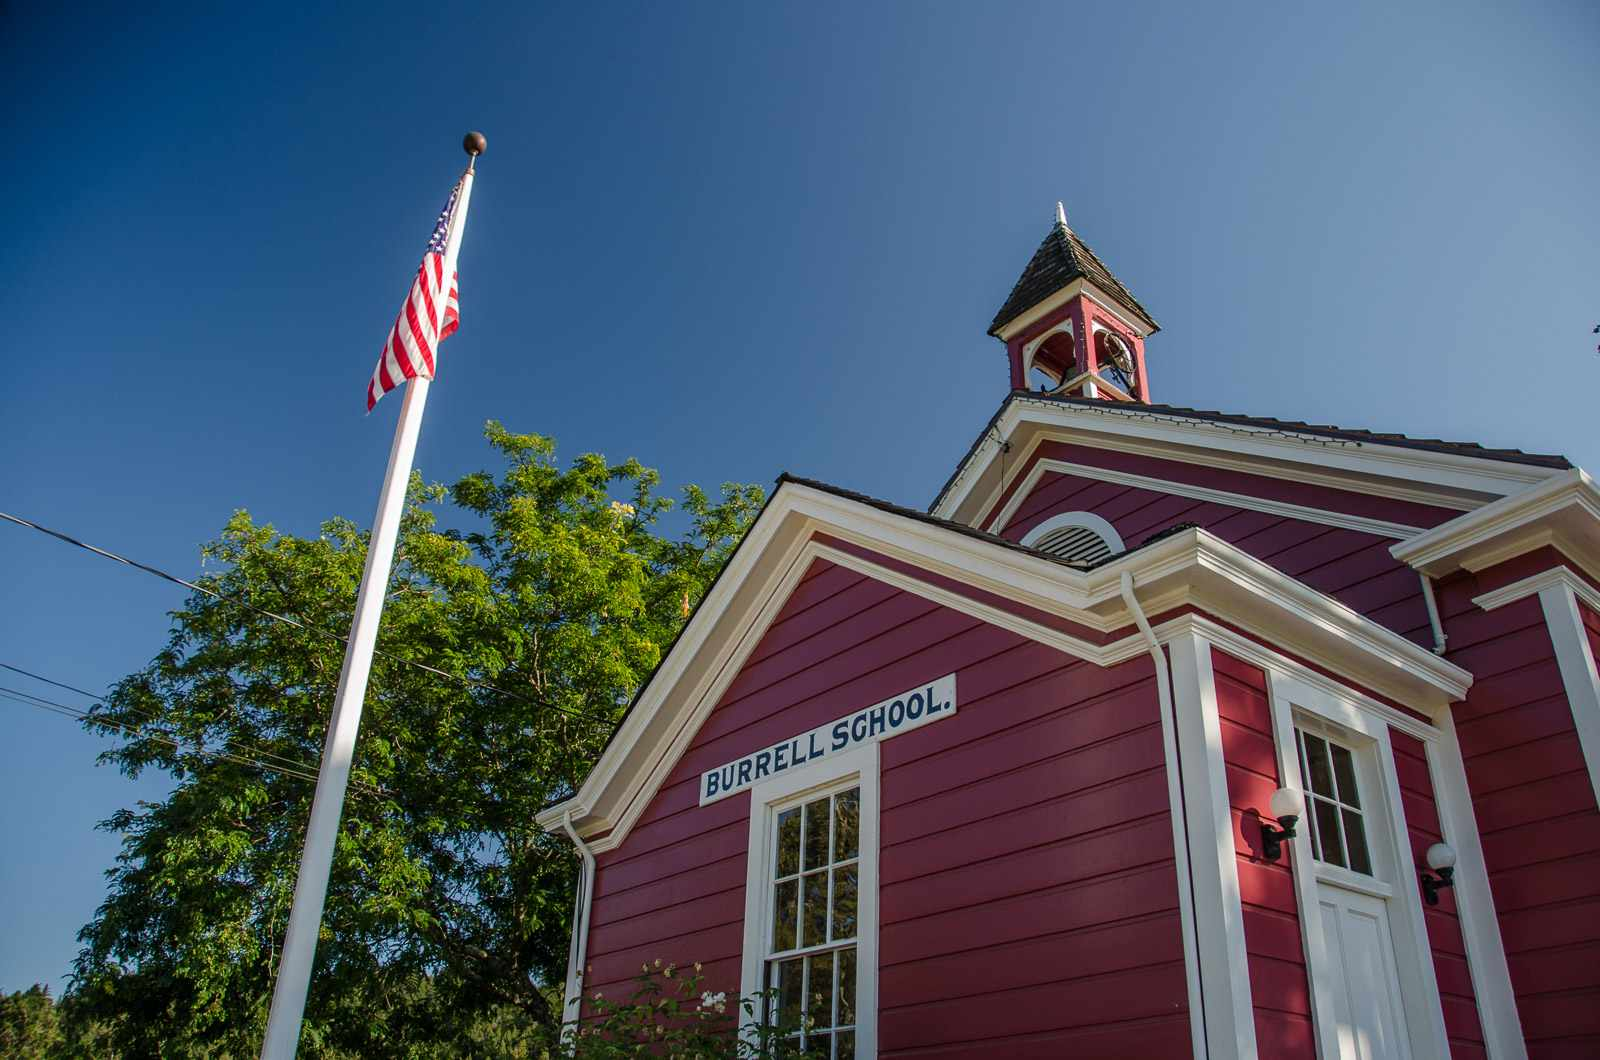 Burrell School Winery, Santa Cruz Mountain Wine Region